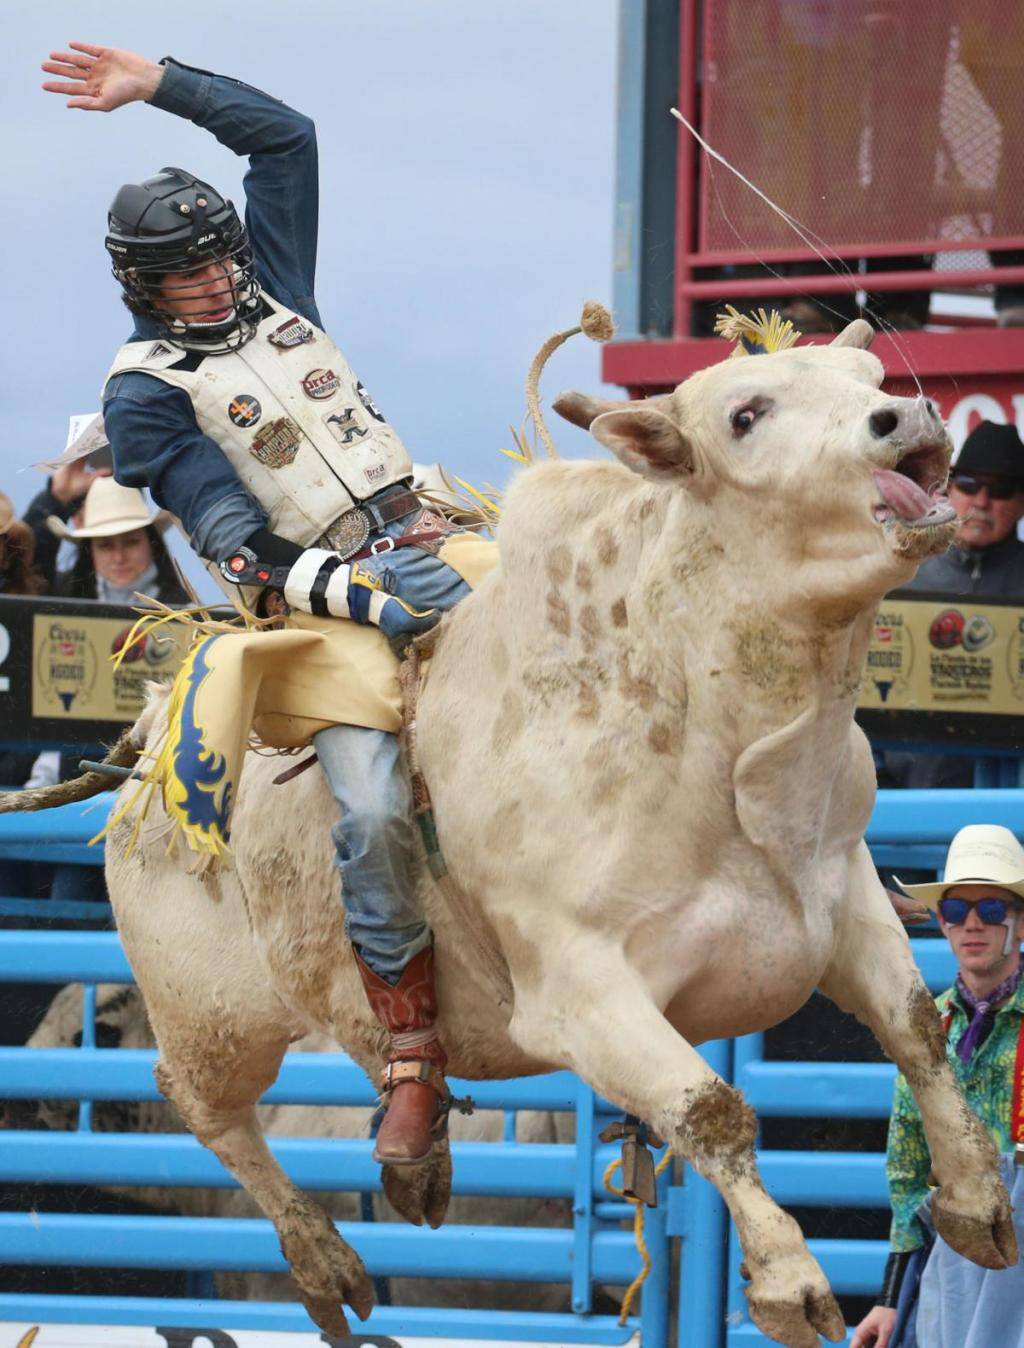 Festival de Vaqueros Maltrato Animal